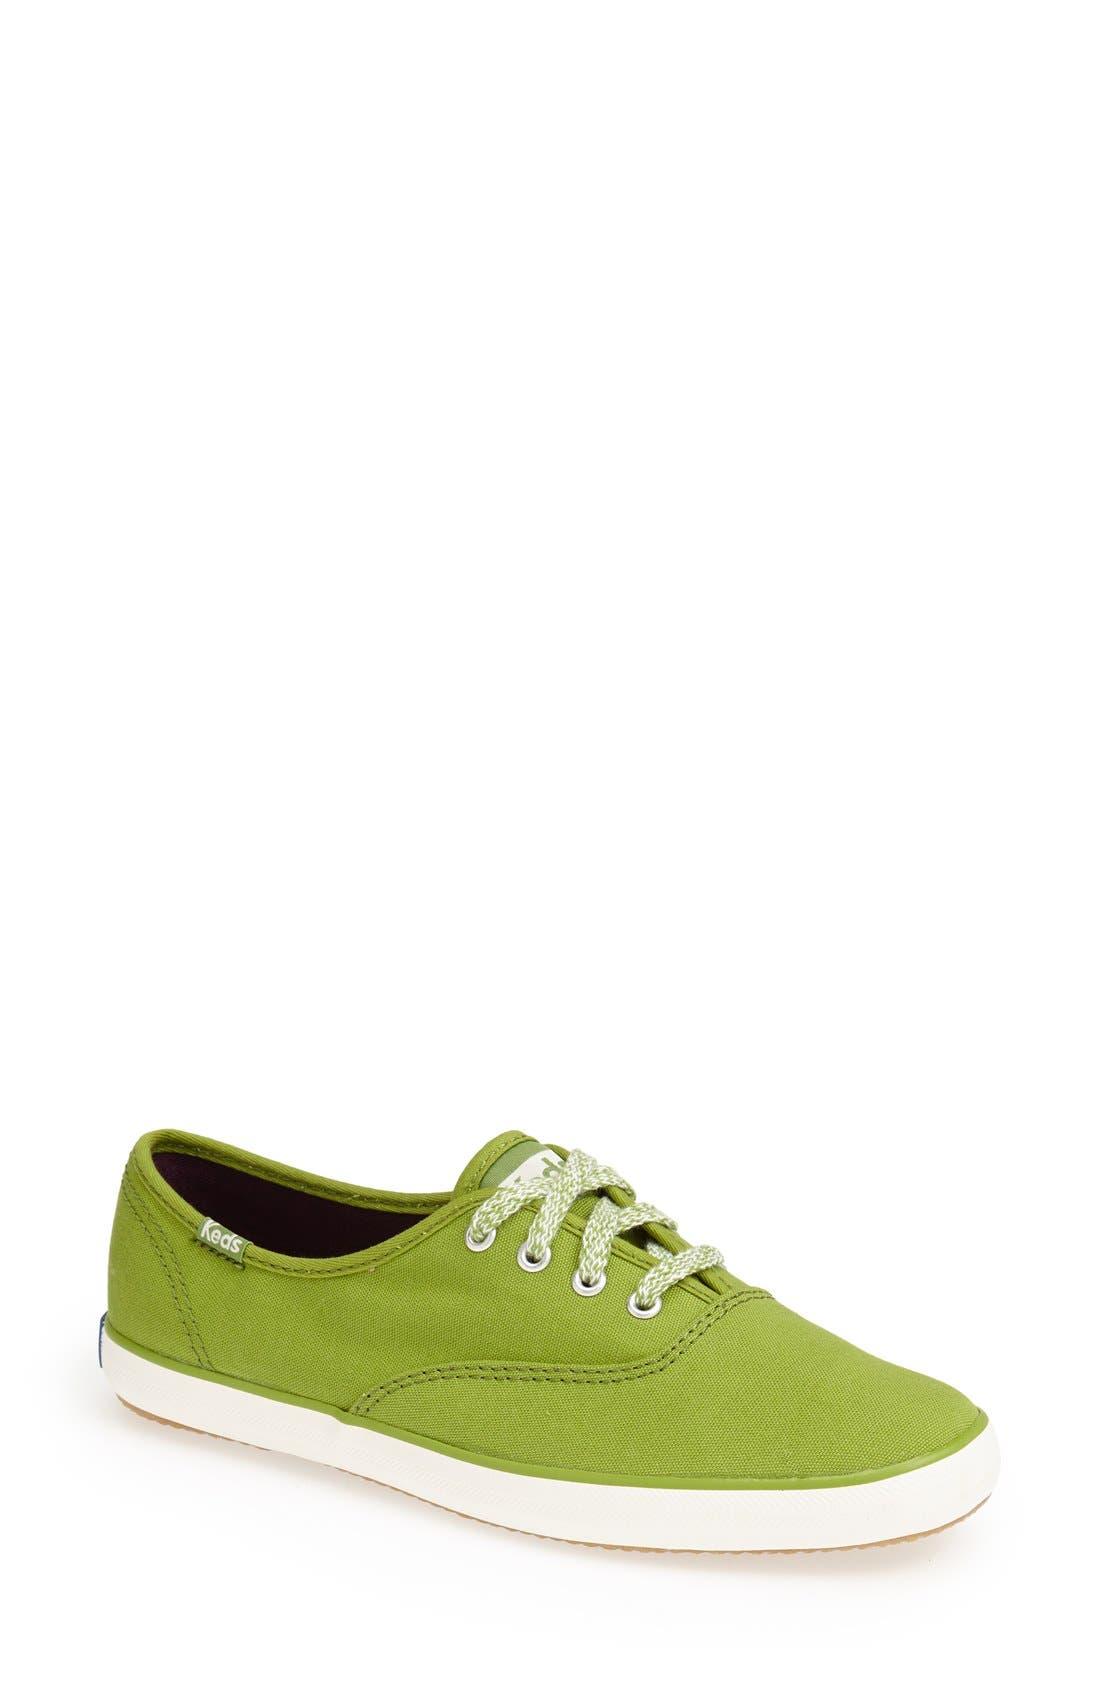 Alternate Image 1 Selected - Keds® 'Champion' Canvas Sneaker (Women)